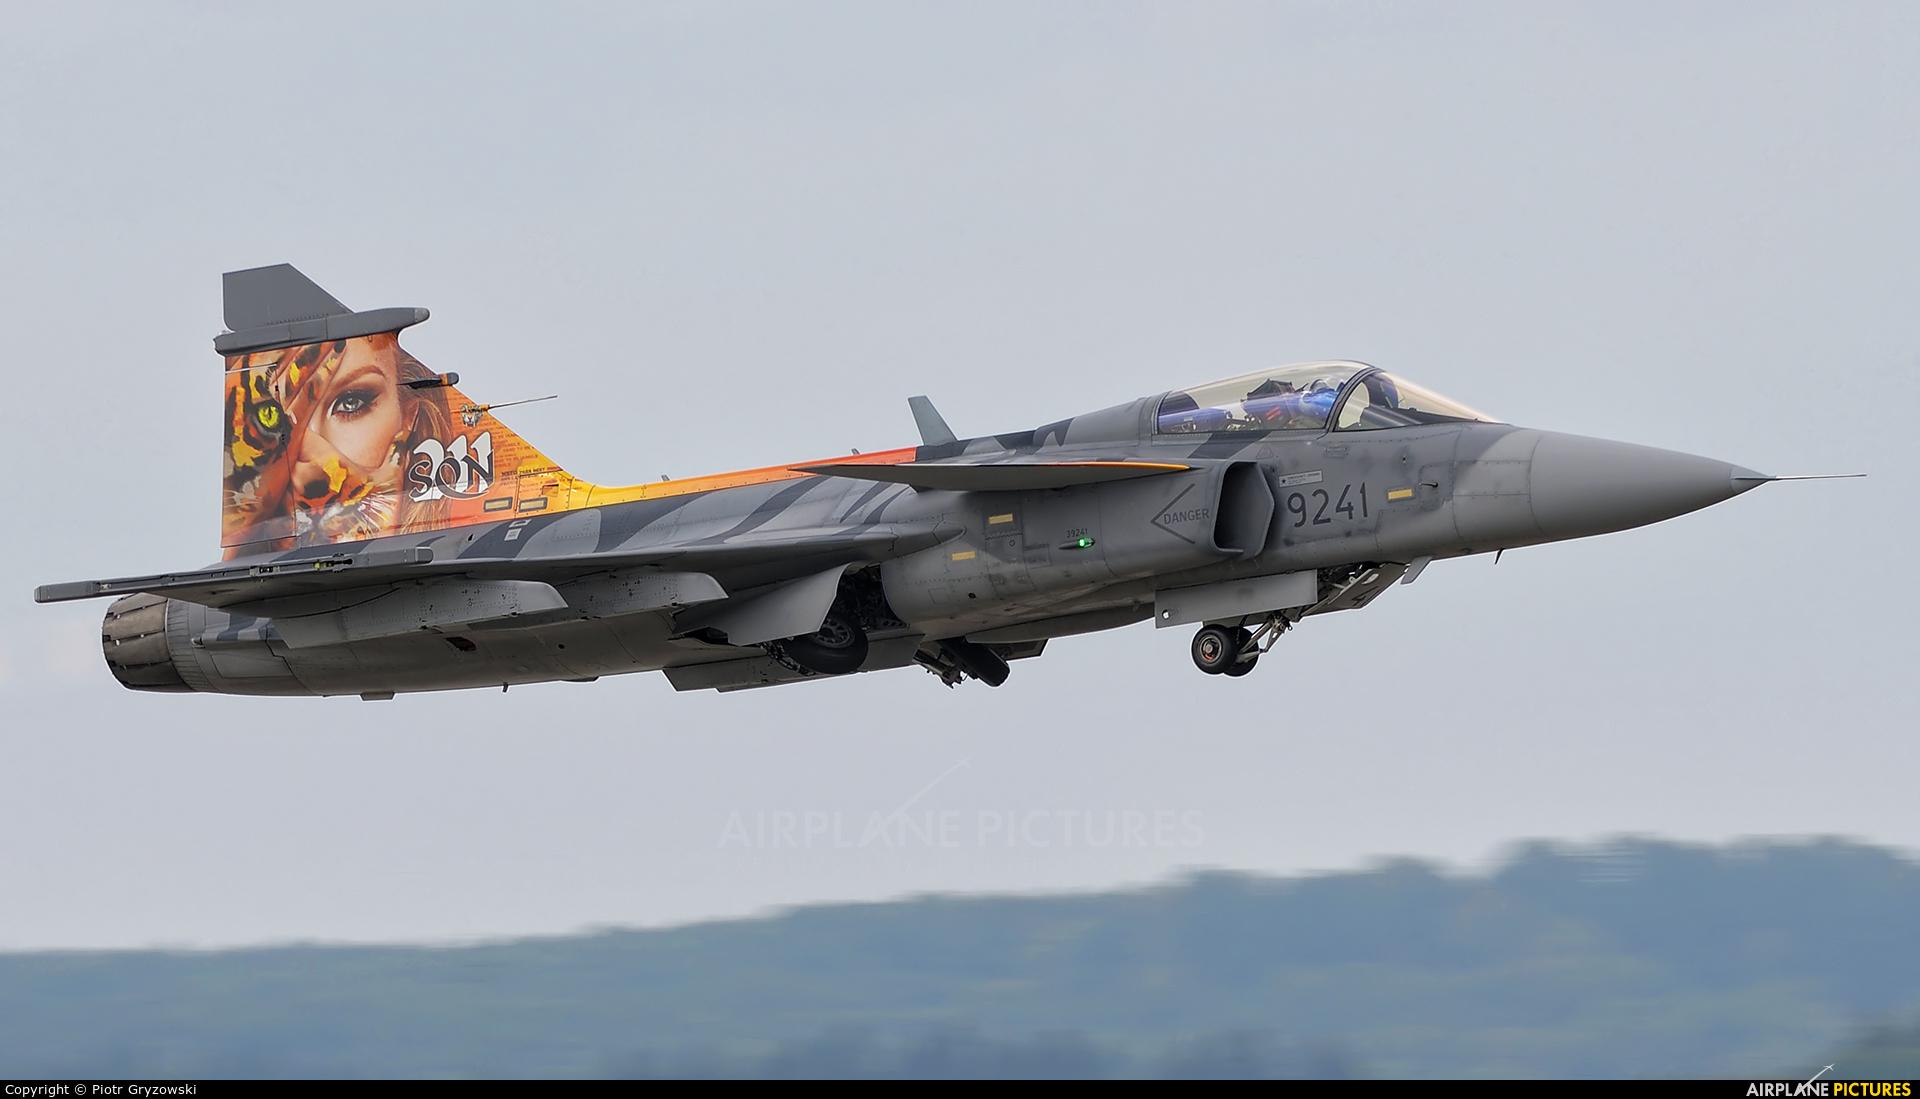 Czech - Air Force 9241 aircraft at Sliač